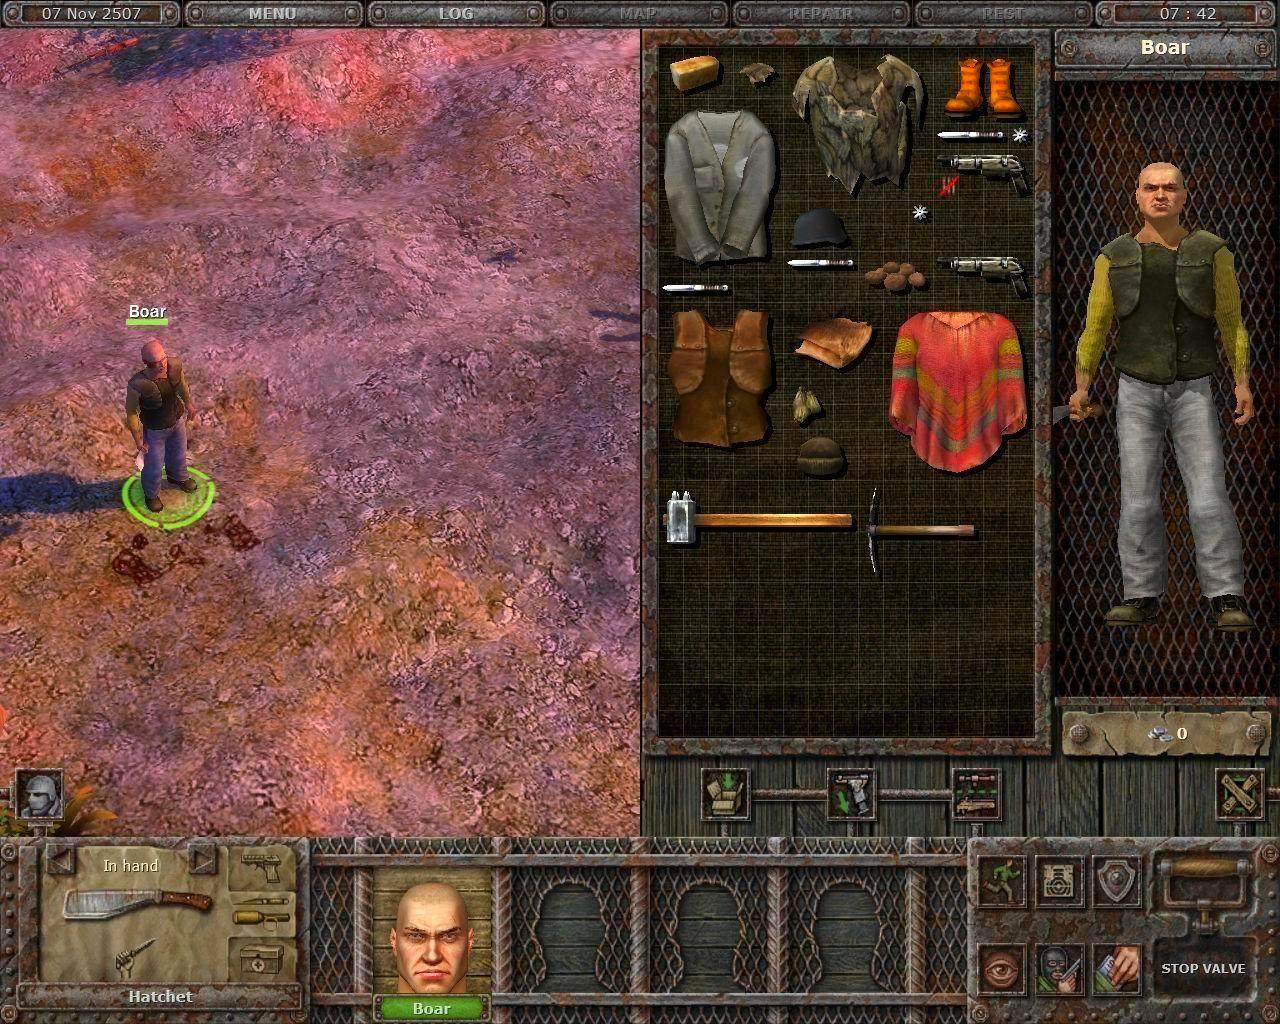 Screenshot from Planet Alcatraz (4/4)